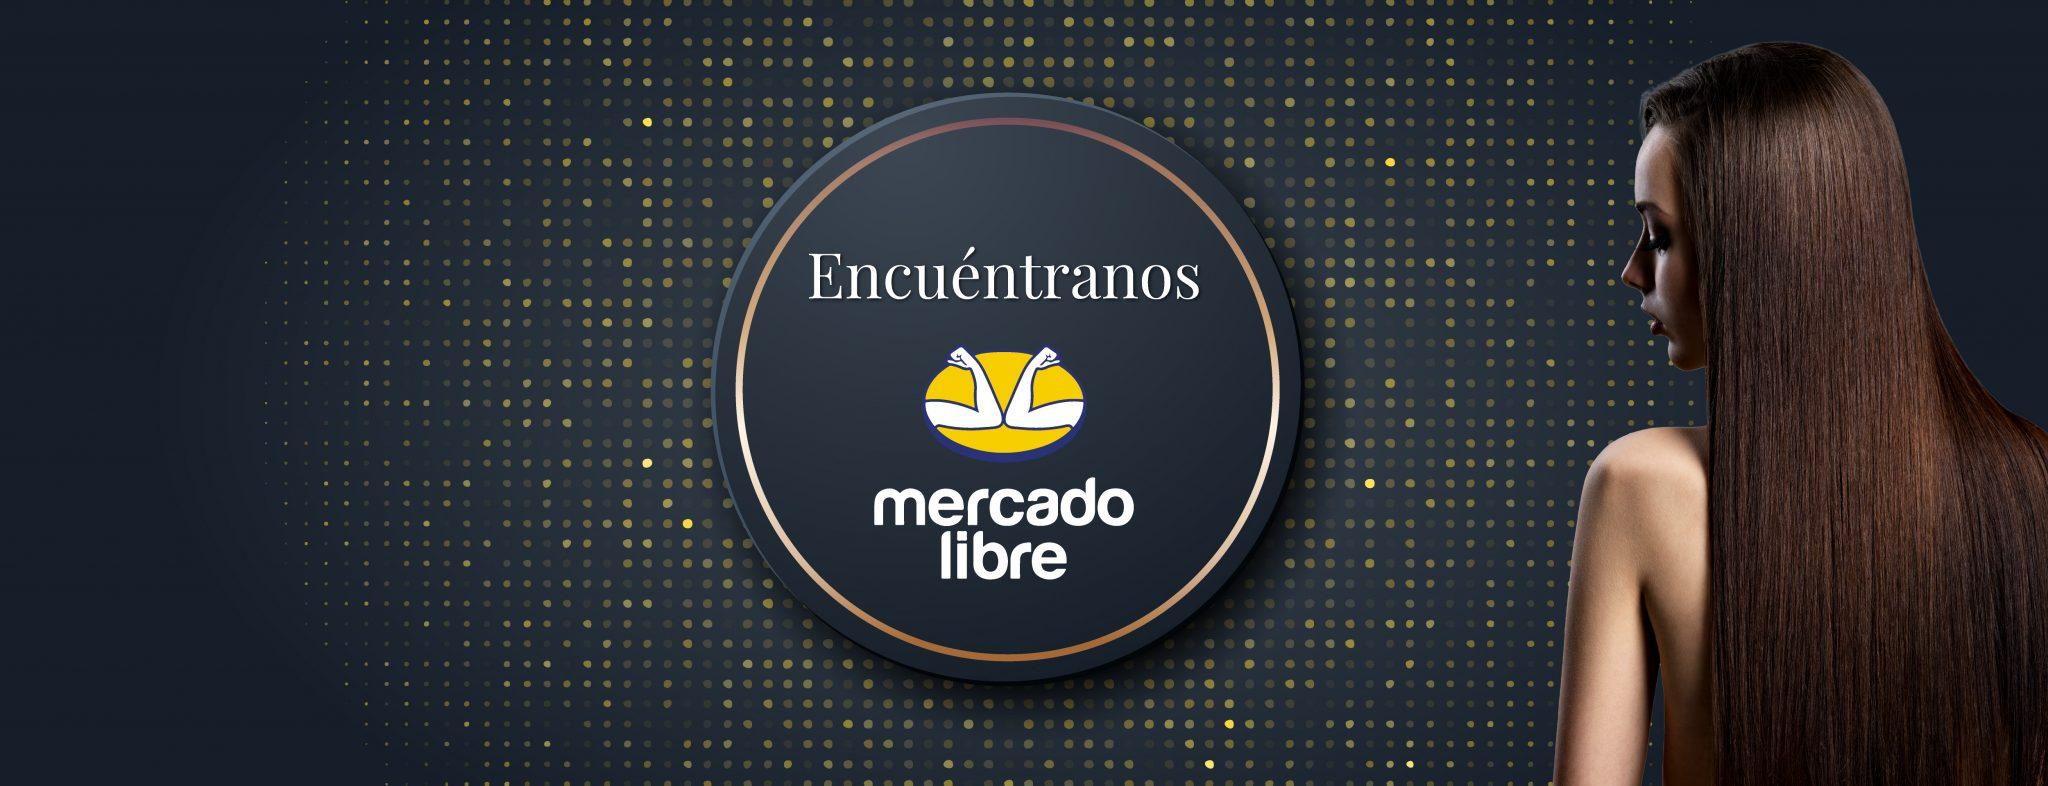 MercadoLibre_ESCRITORIO